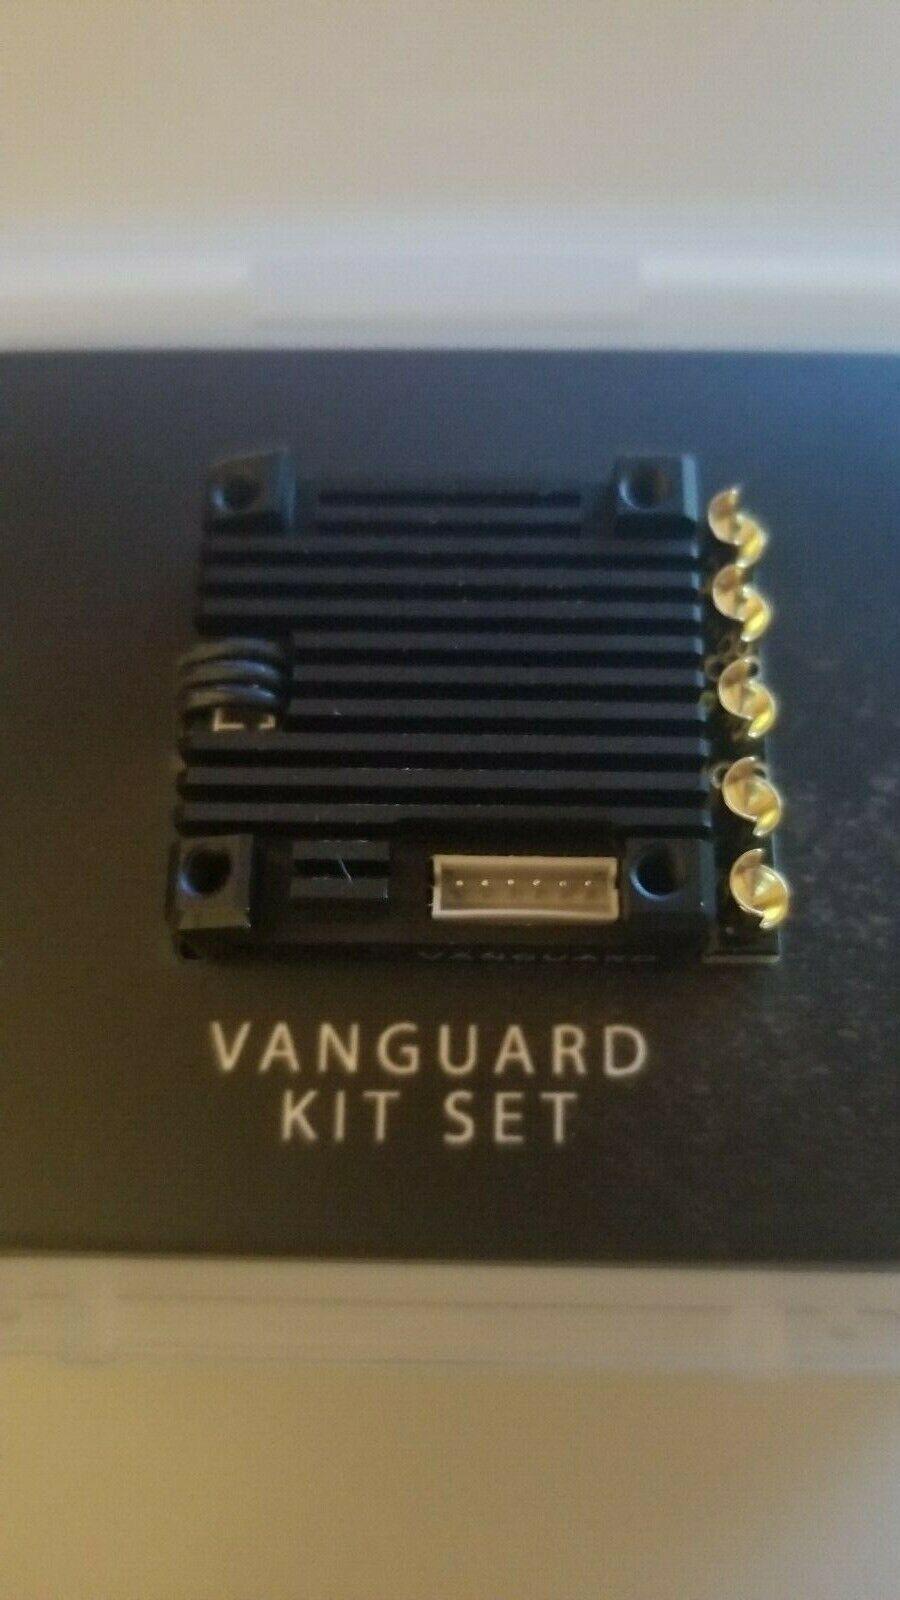 Scorpion Vanguard S2-50 Stock Esc